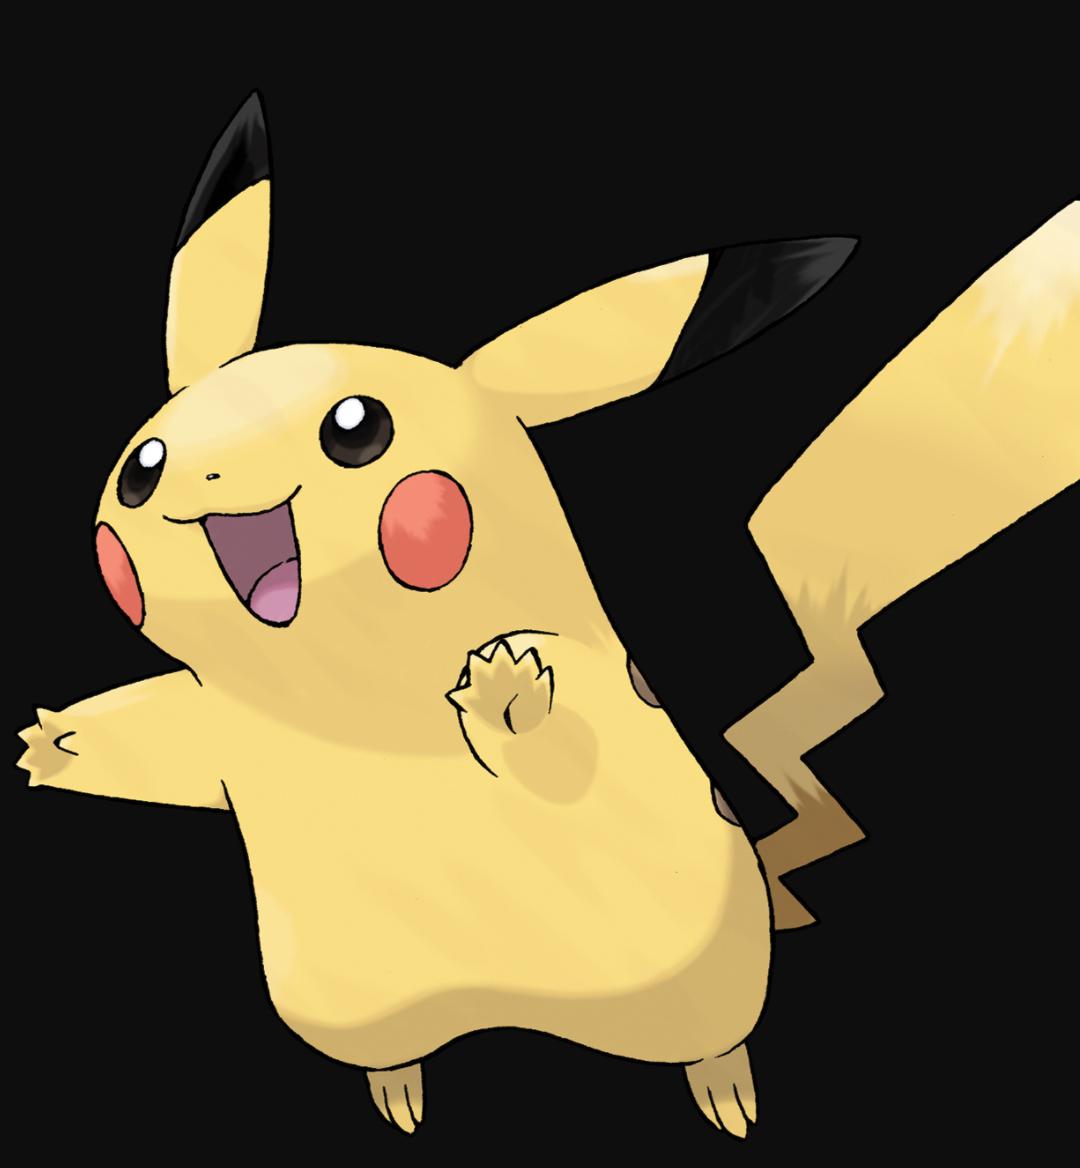 pikachu mobile